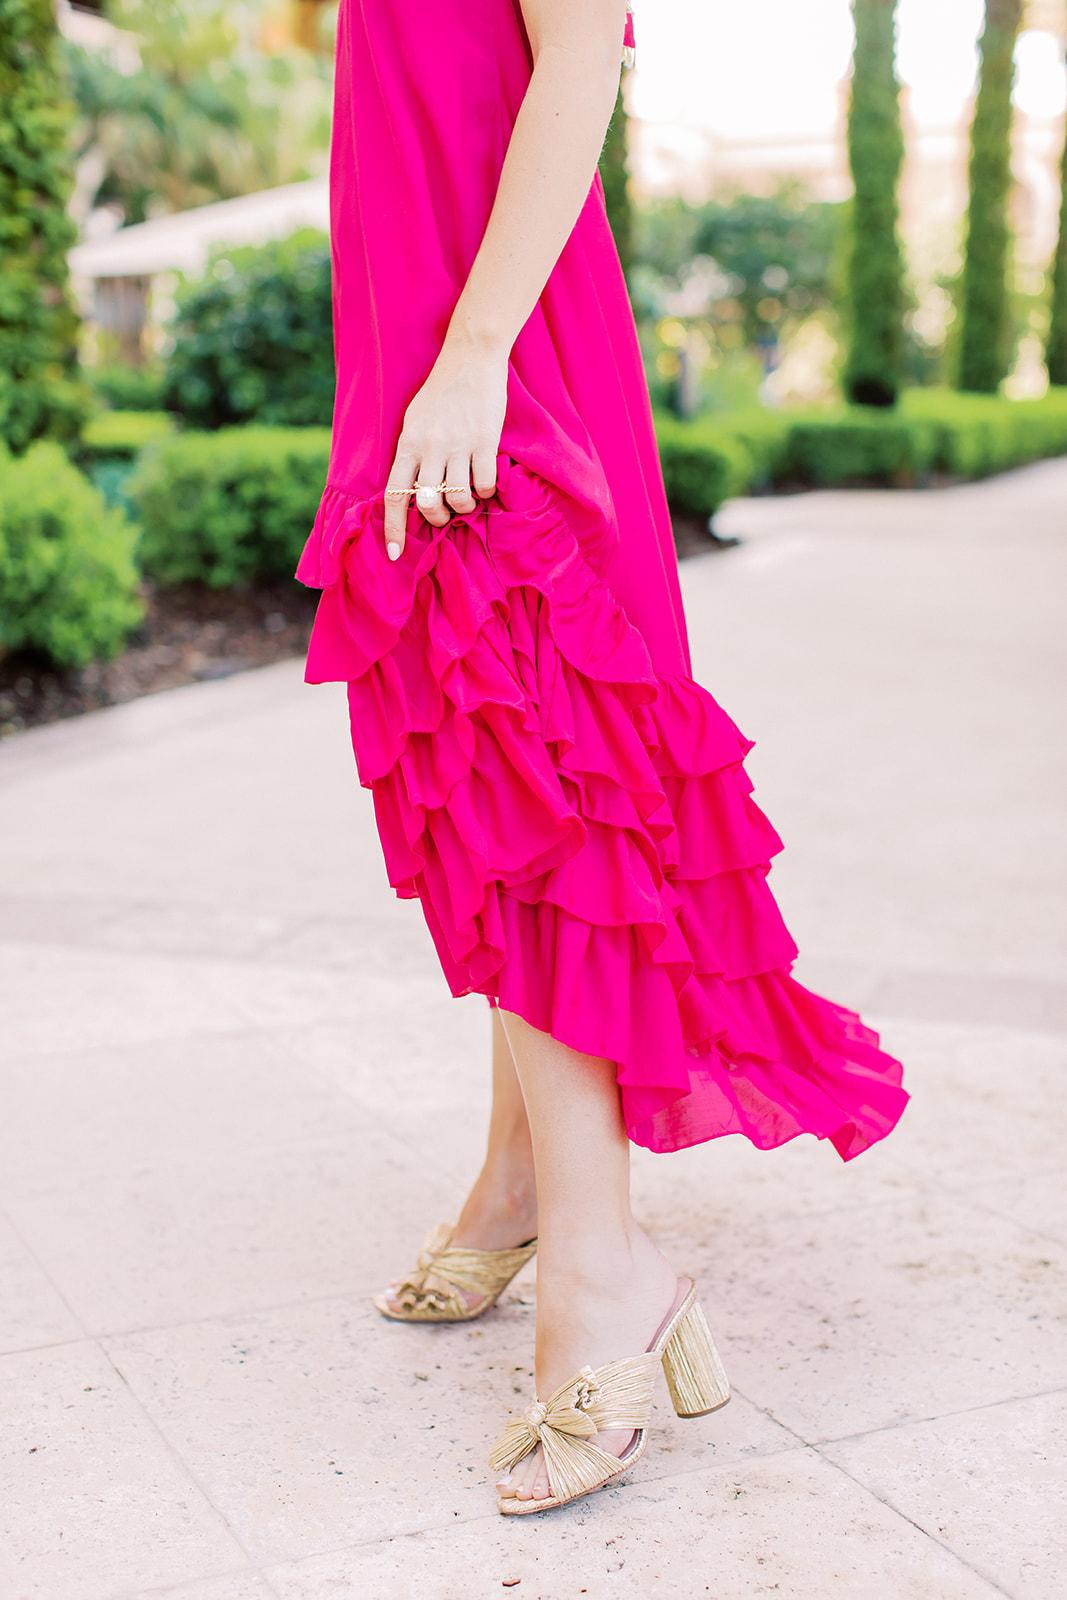 hot pink maxi dress, gold knot necklace, gold hoop earrings, gold loeffler randall penny heels